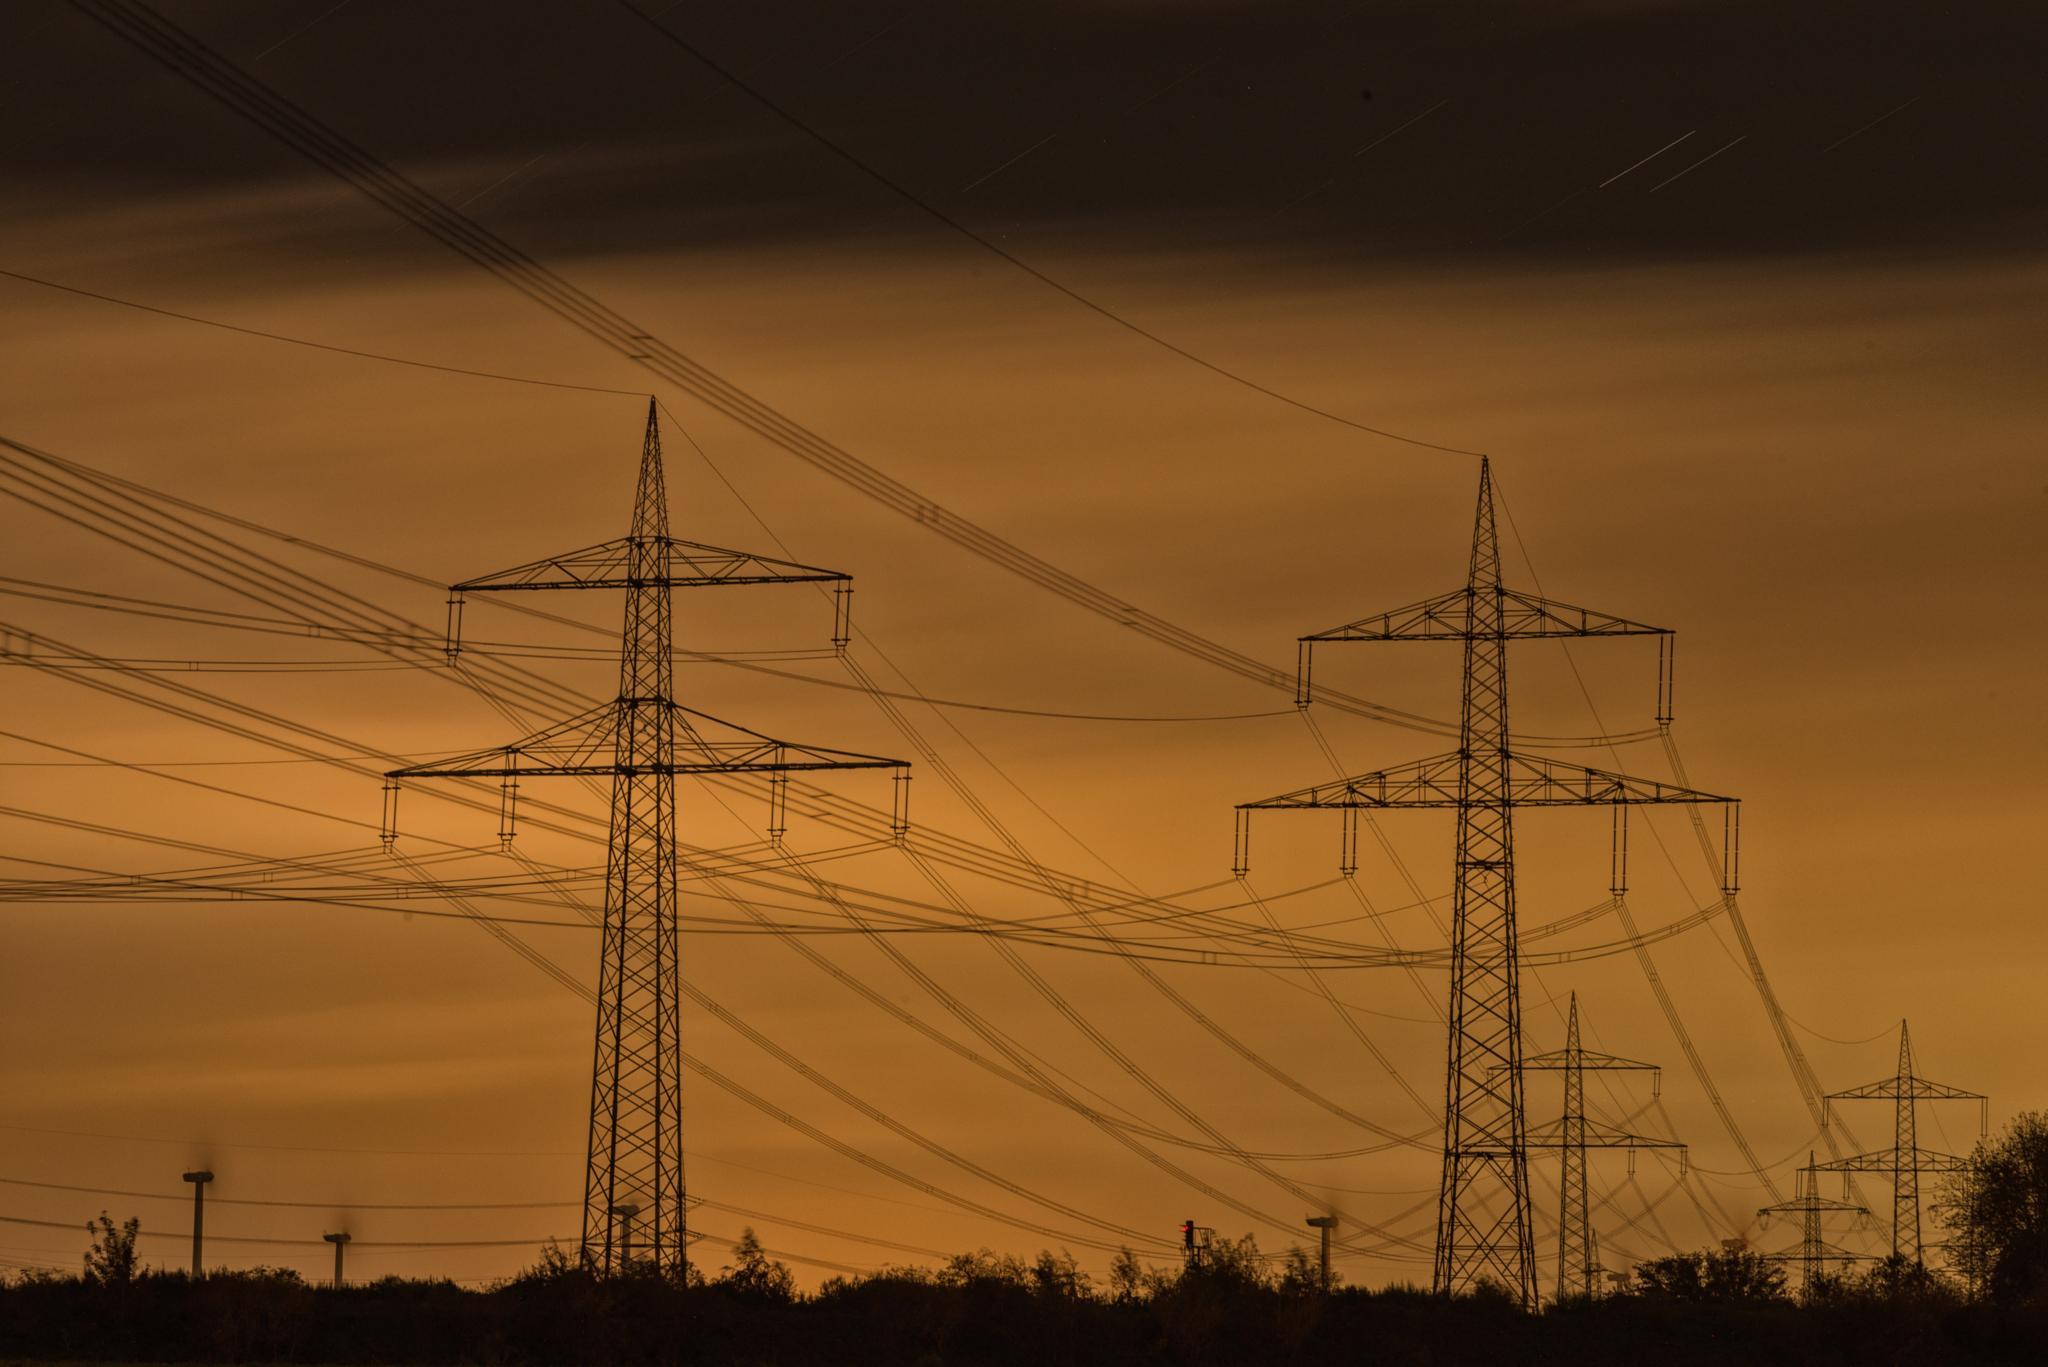 Powergrid by Joachim Lehmann